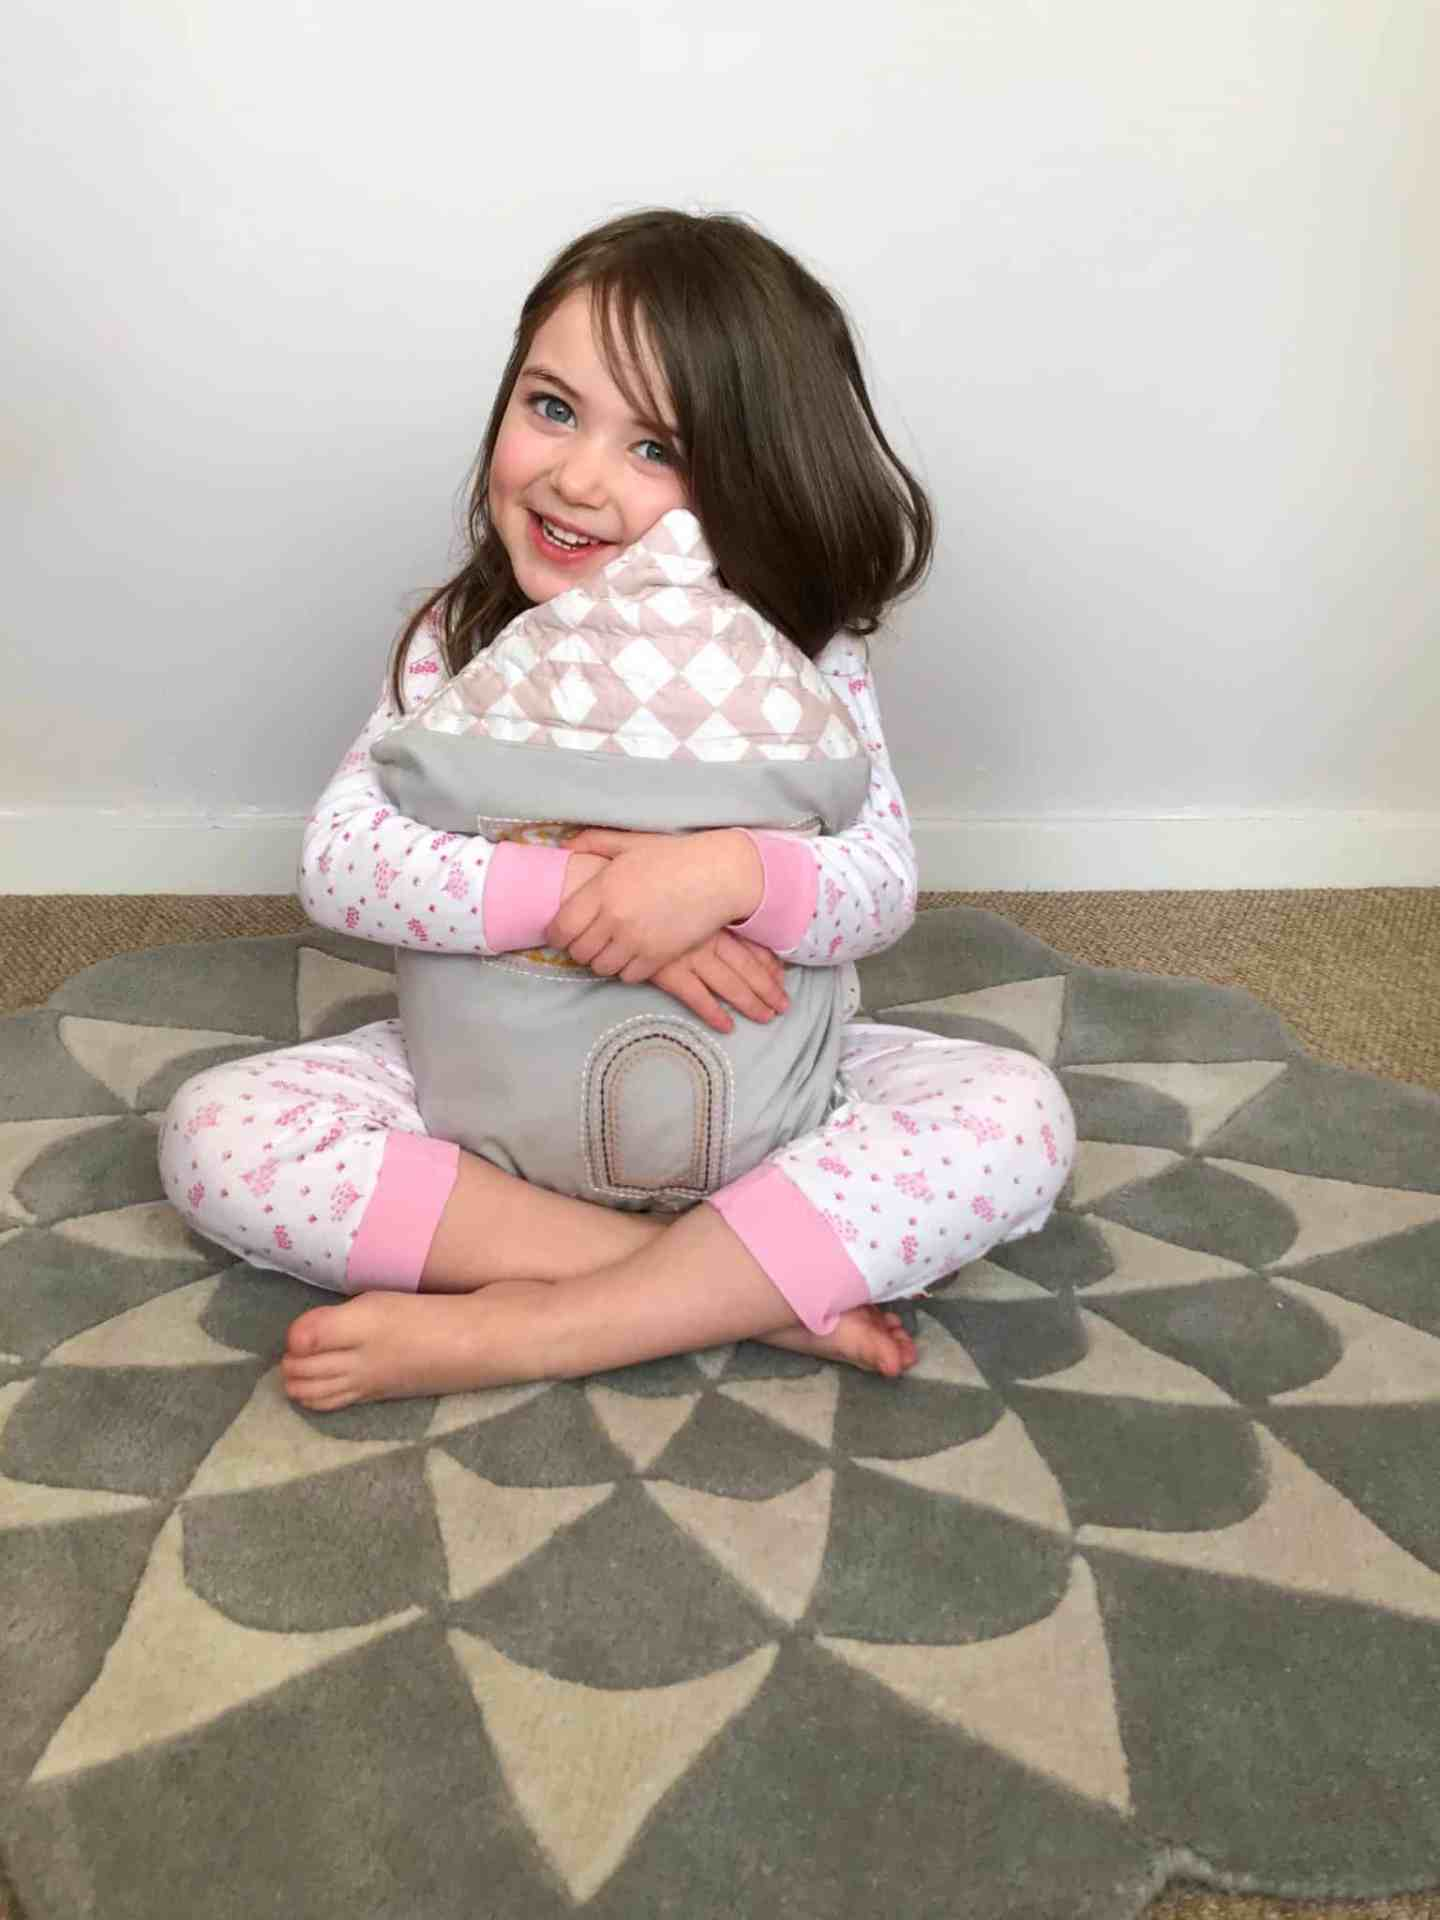 Cuddling a house cushion on a grey patterned rug